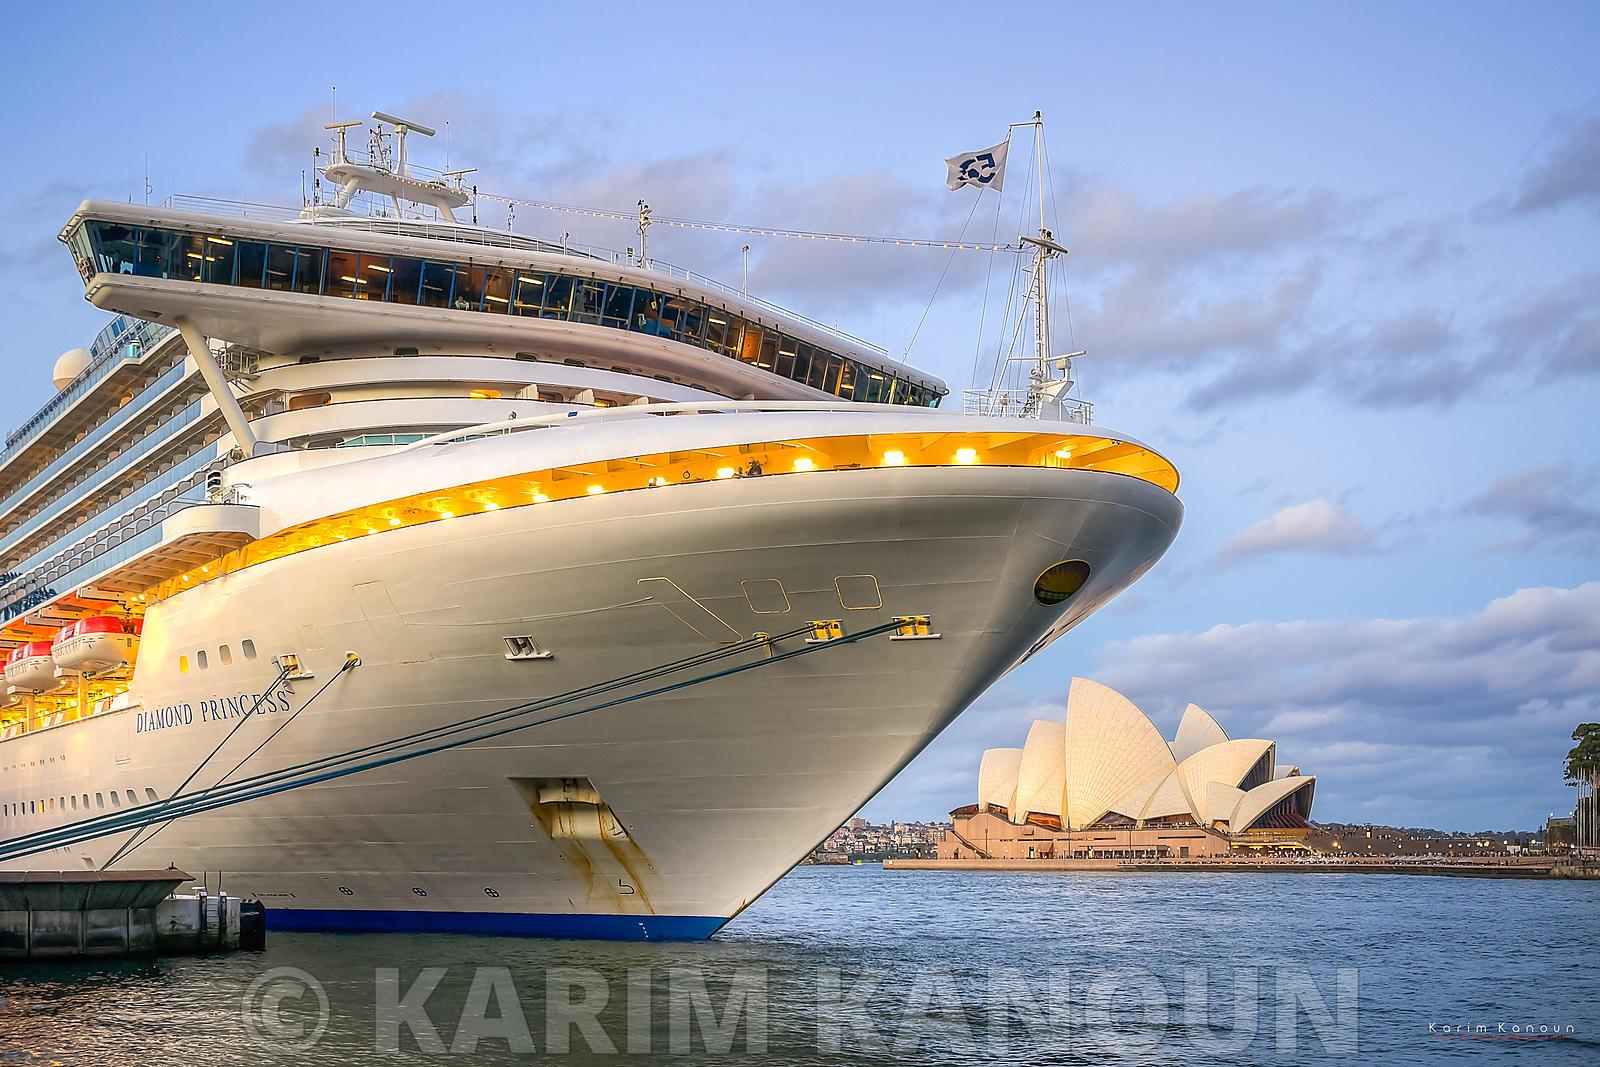 Sydney Opera House behind a cruising boat